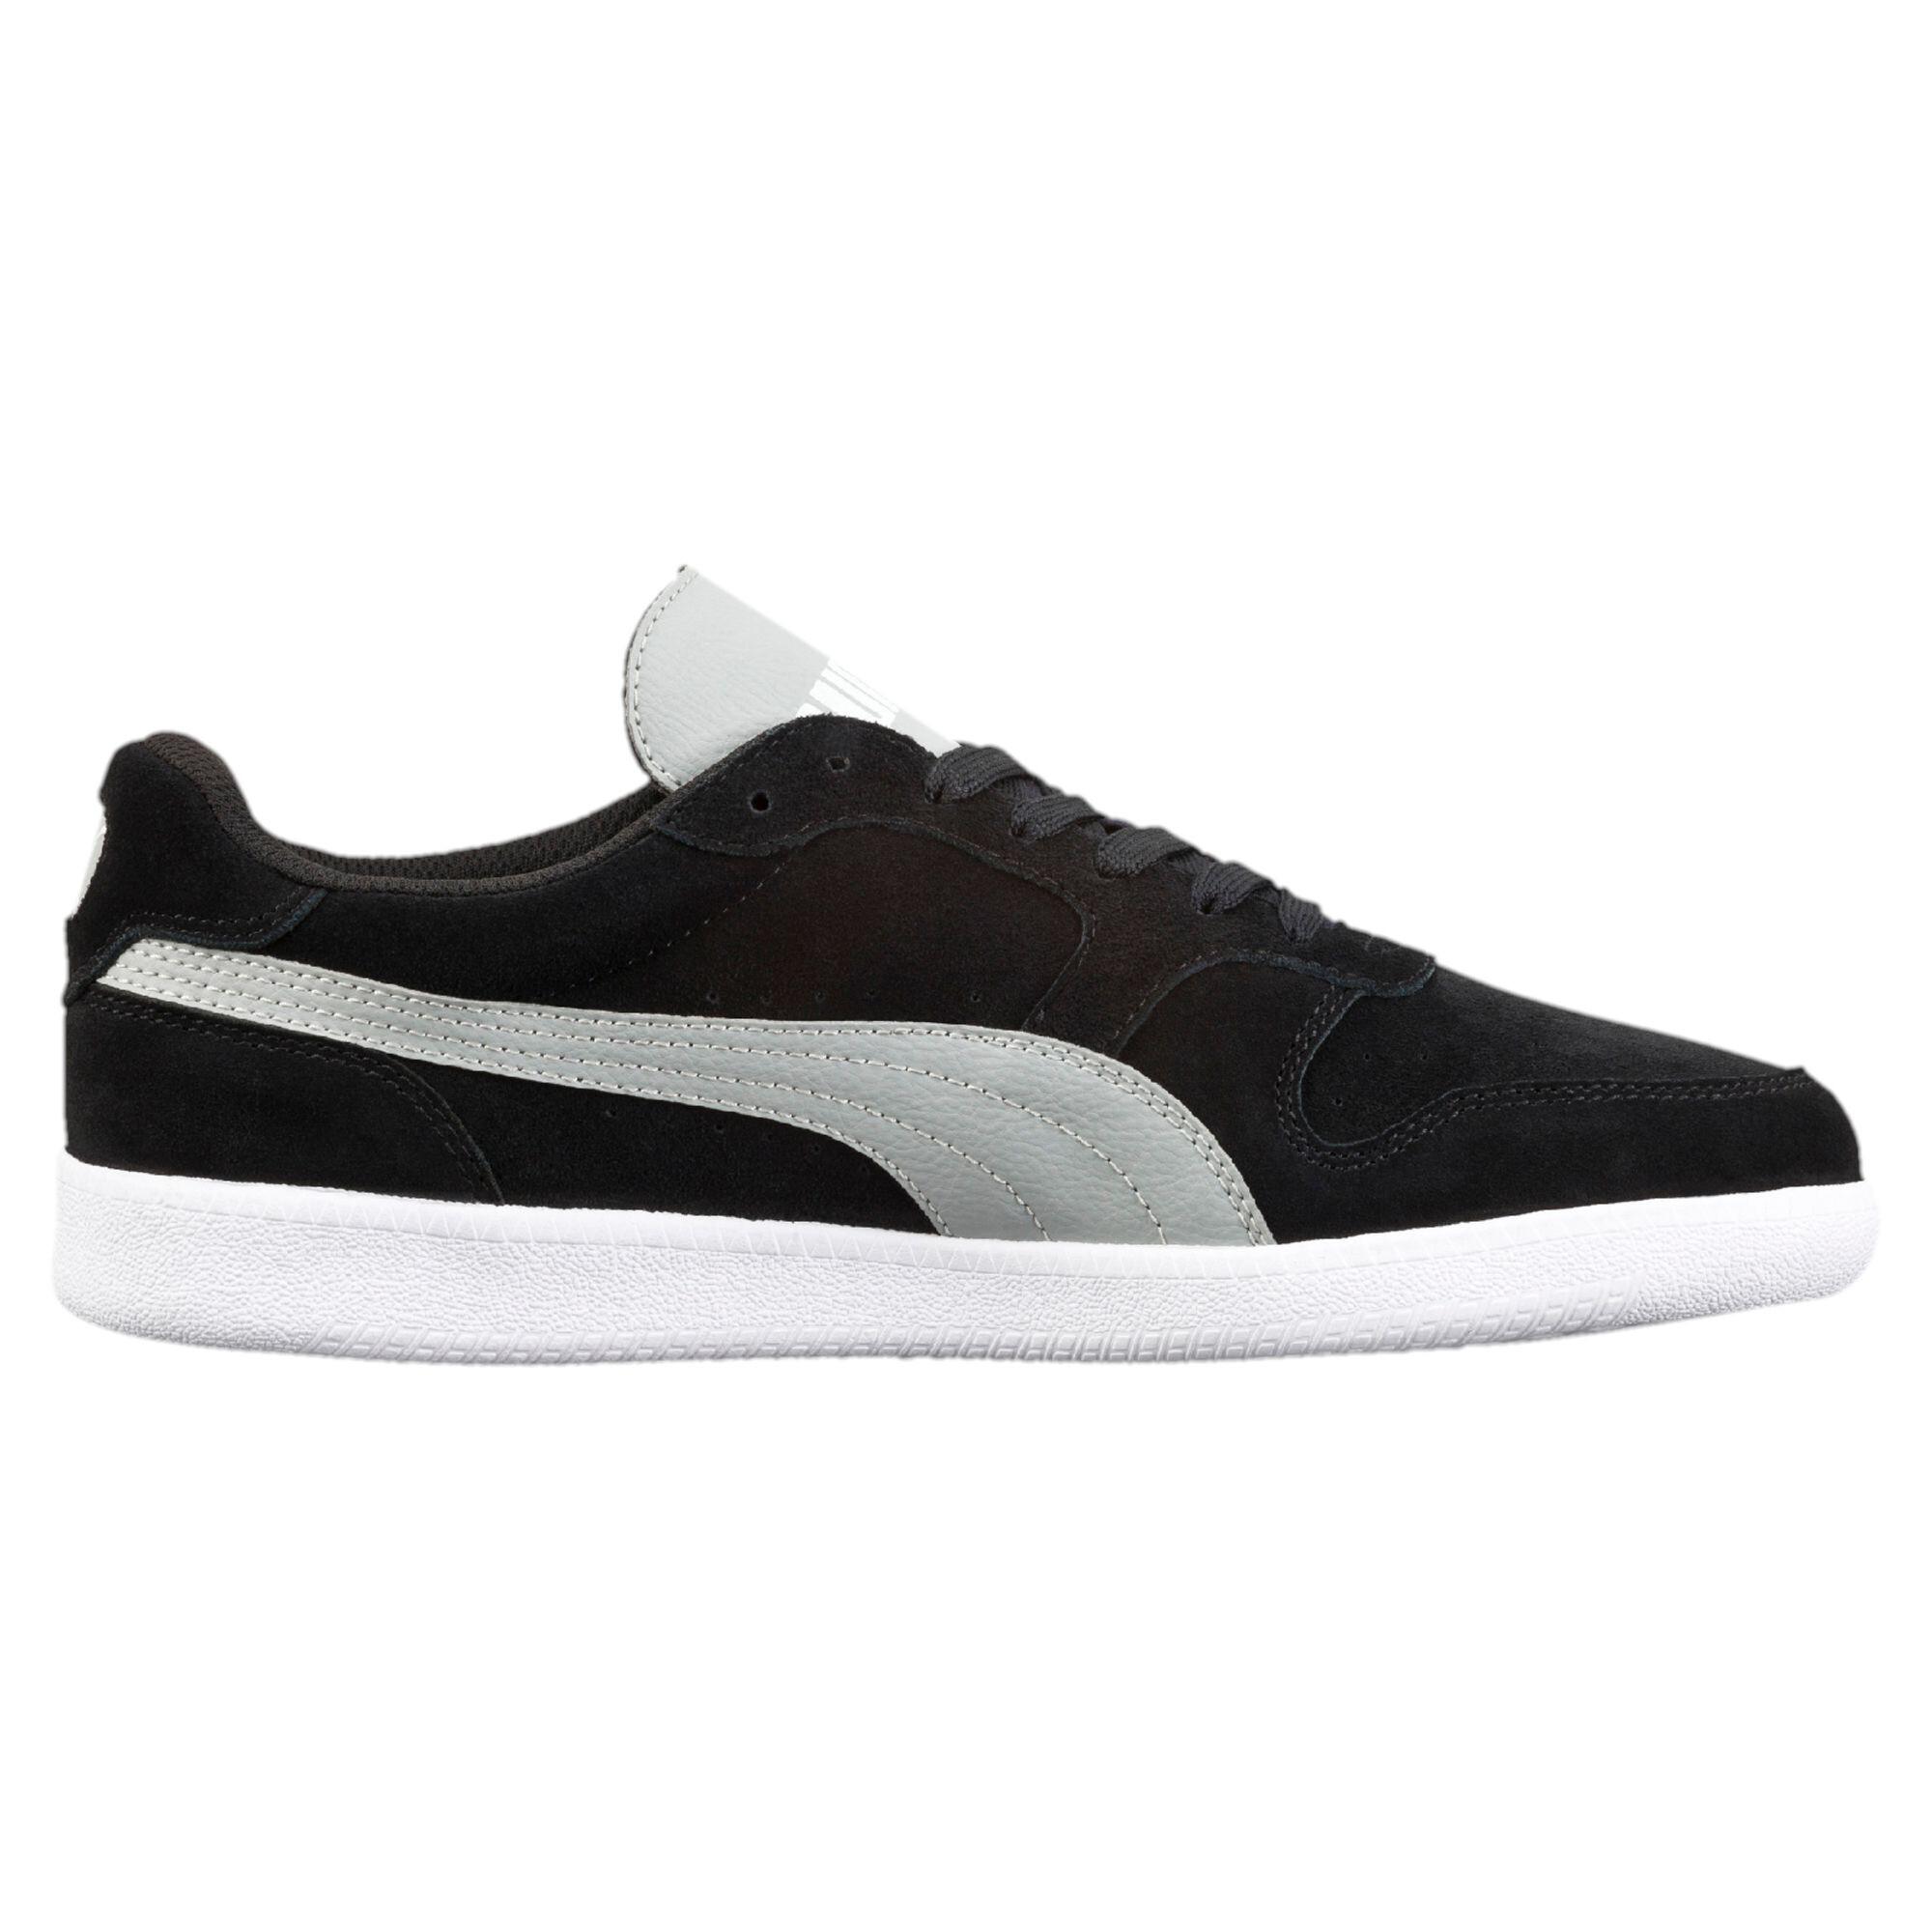 Image Puma Icra Suede Men's Sneakers #3